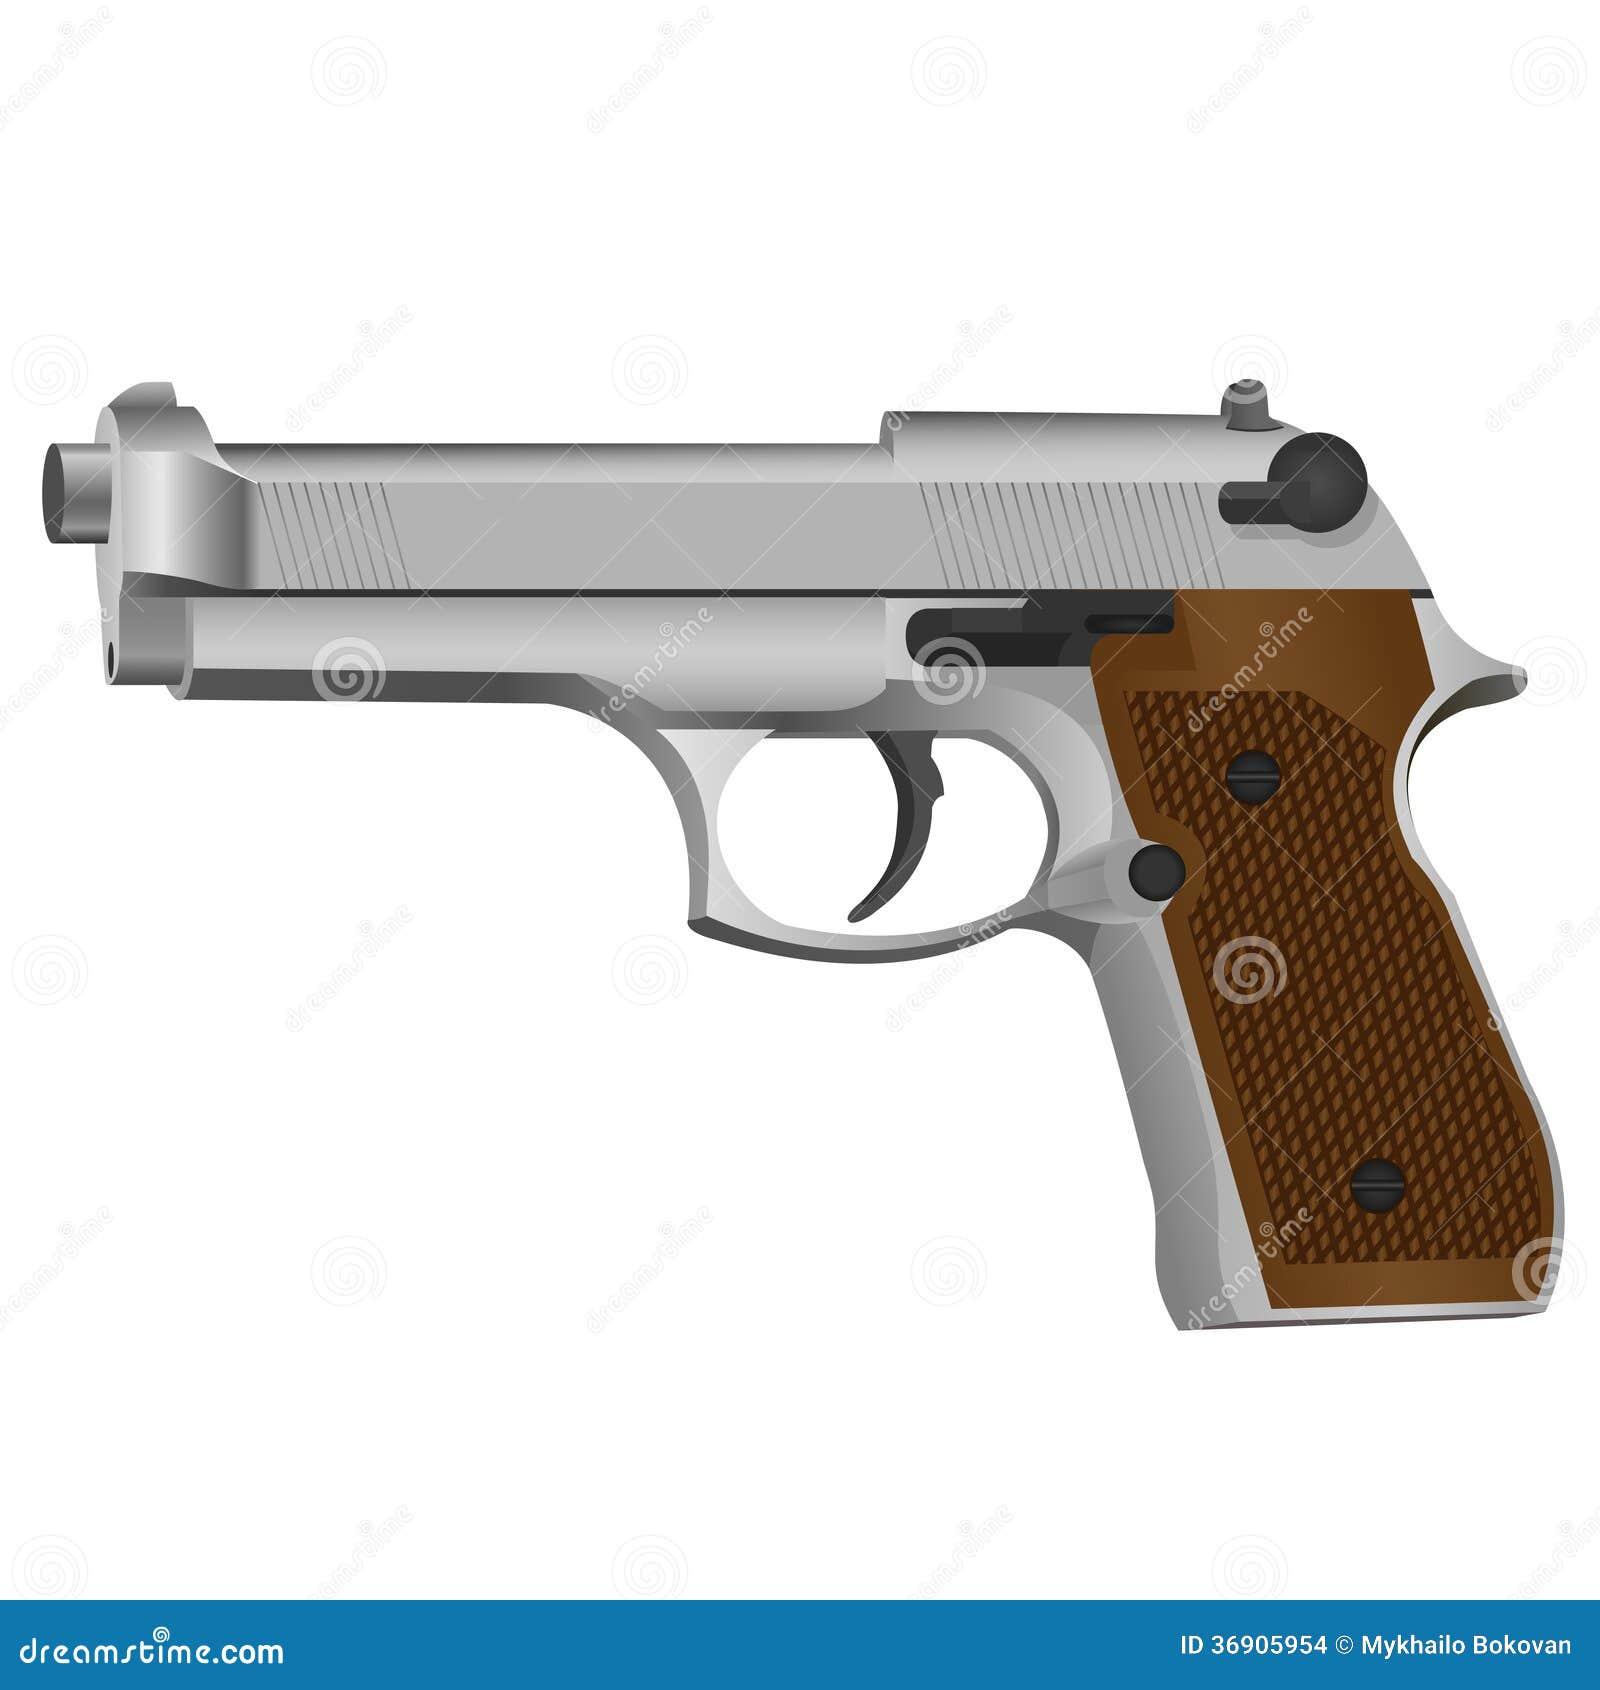 Półautomatyczny pistolet